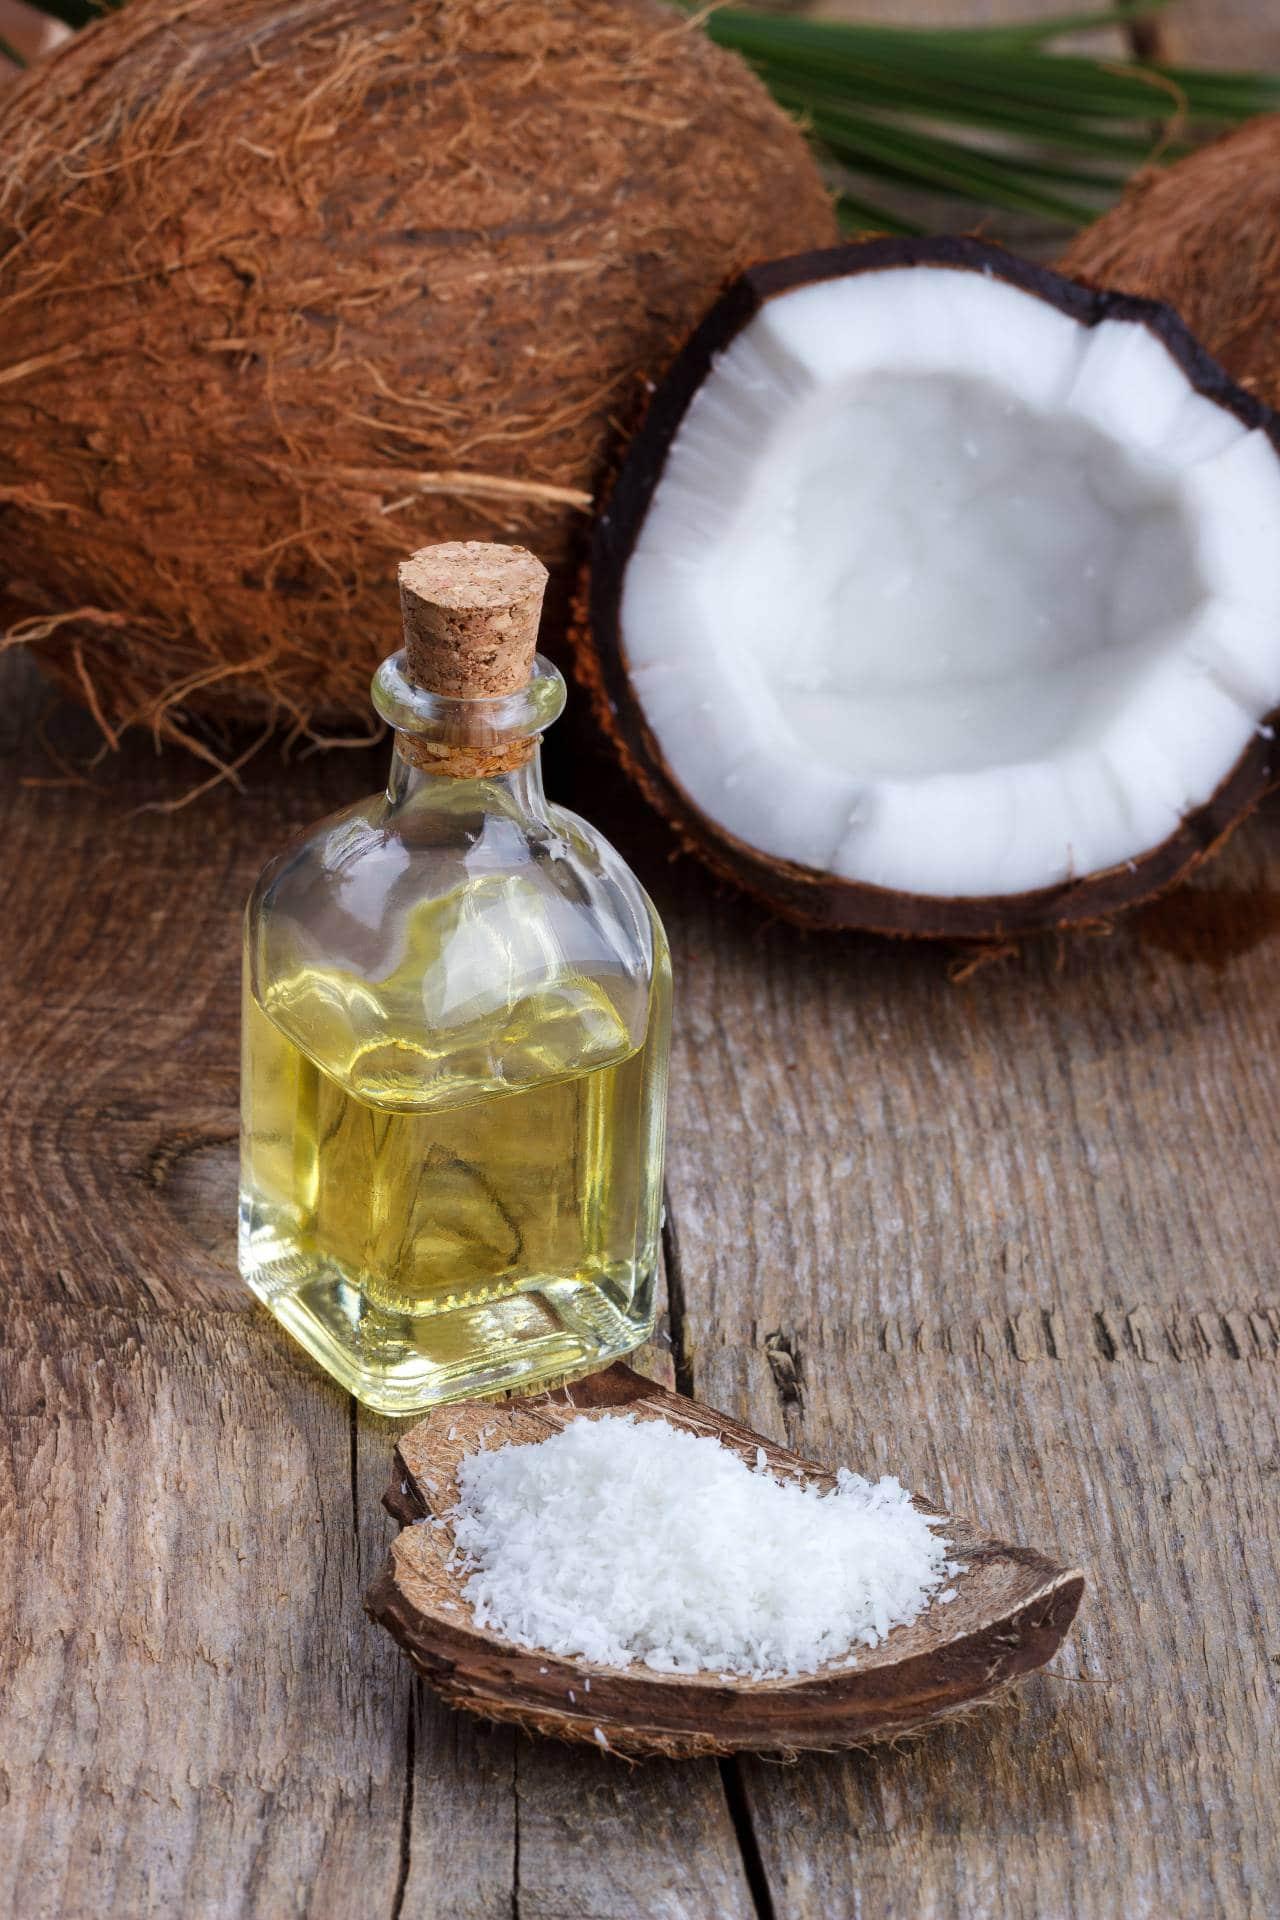 se restauración rip off grasa de coco